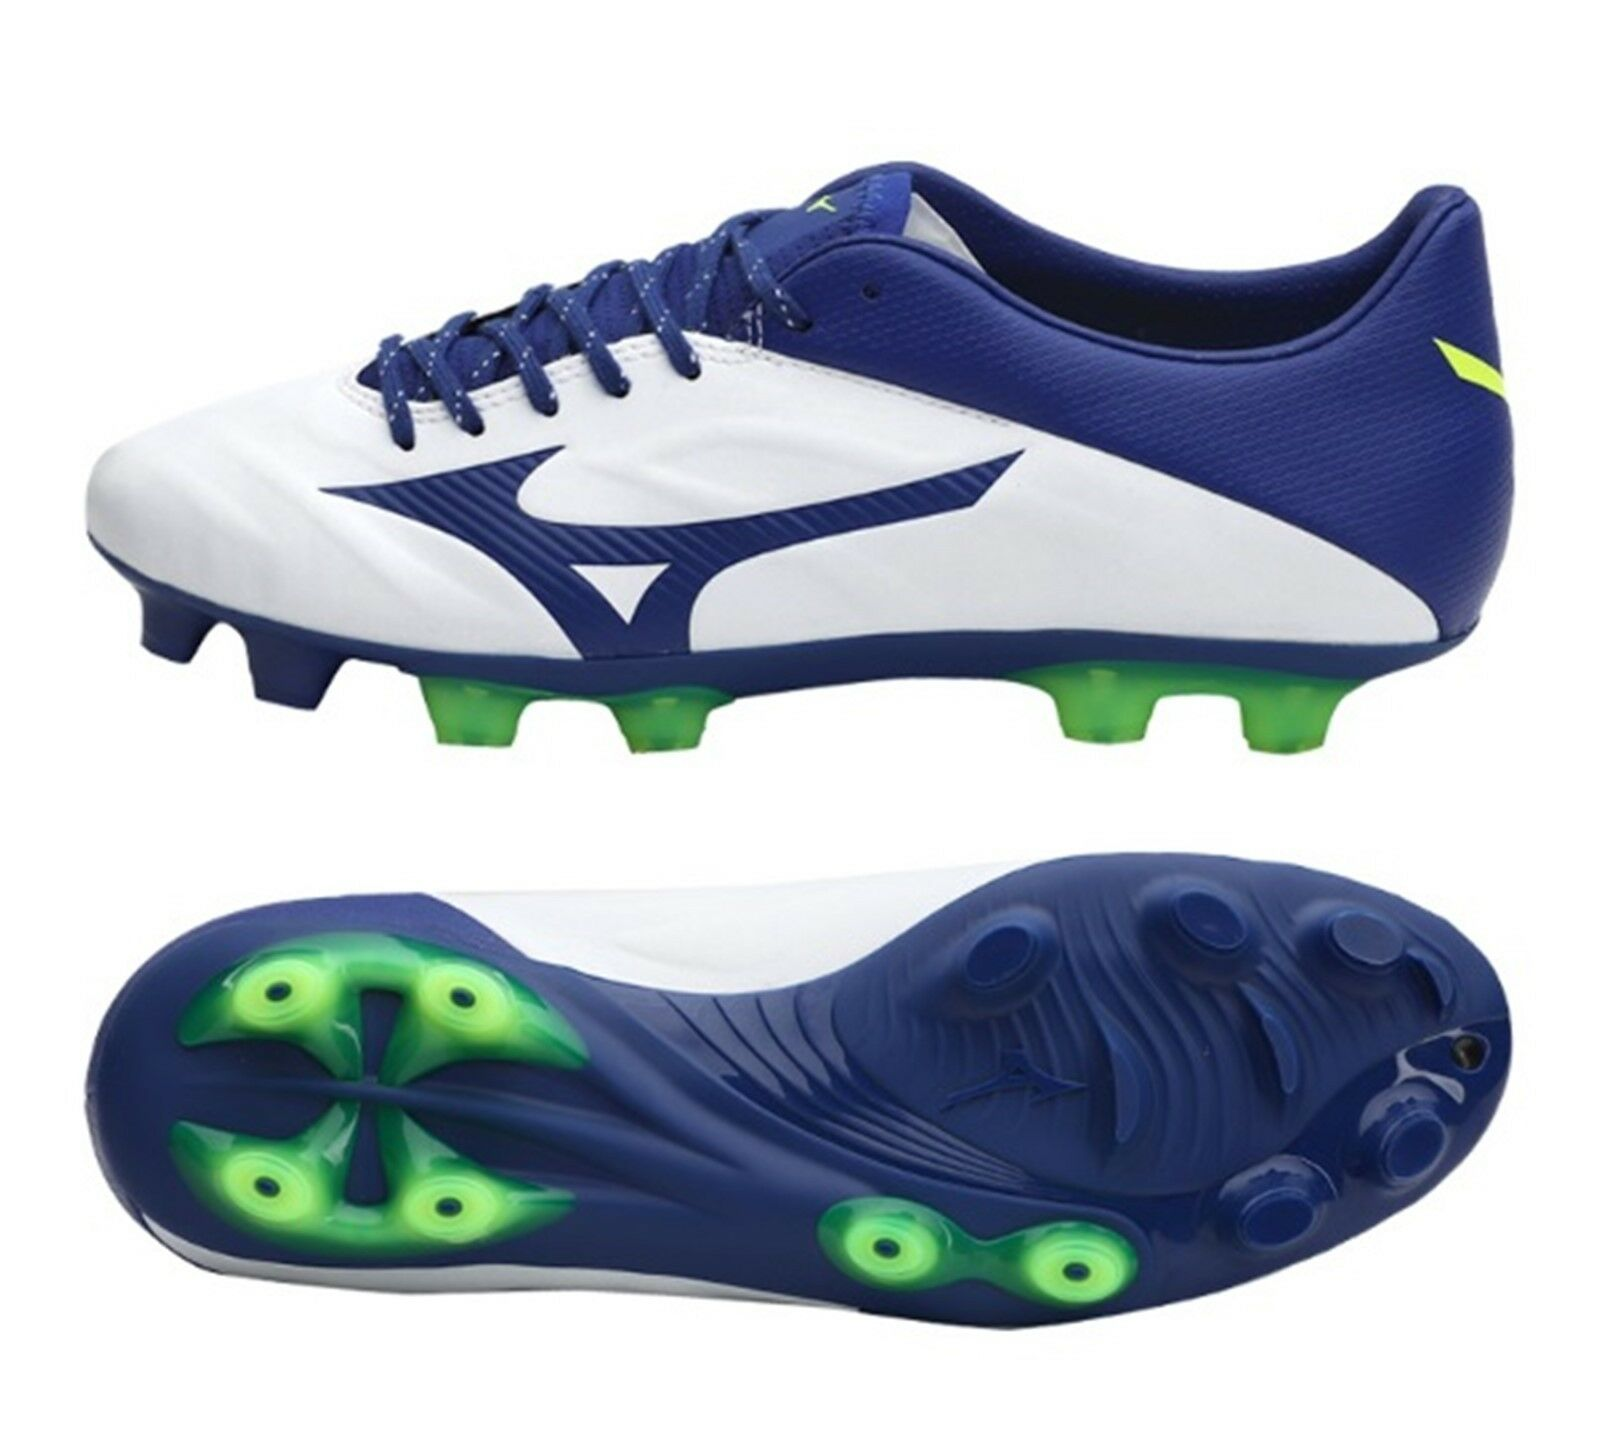 Mizuno Hombre Rebula 2 V2 SL Botines De Fútbol blancoo Azul Fútbol Spike P1GA197419